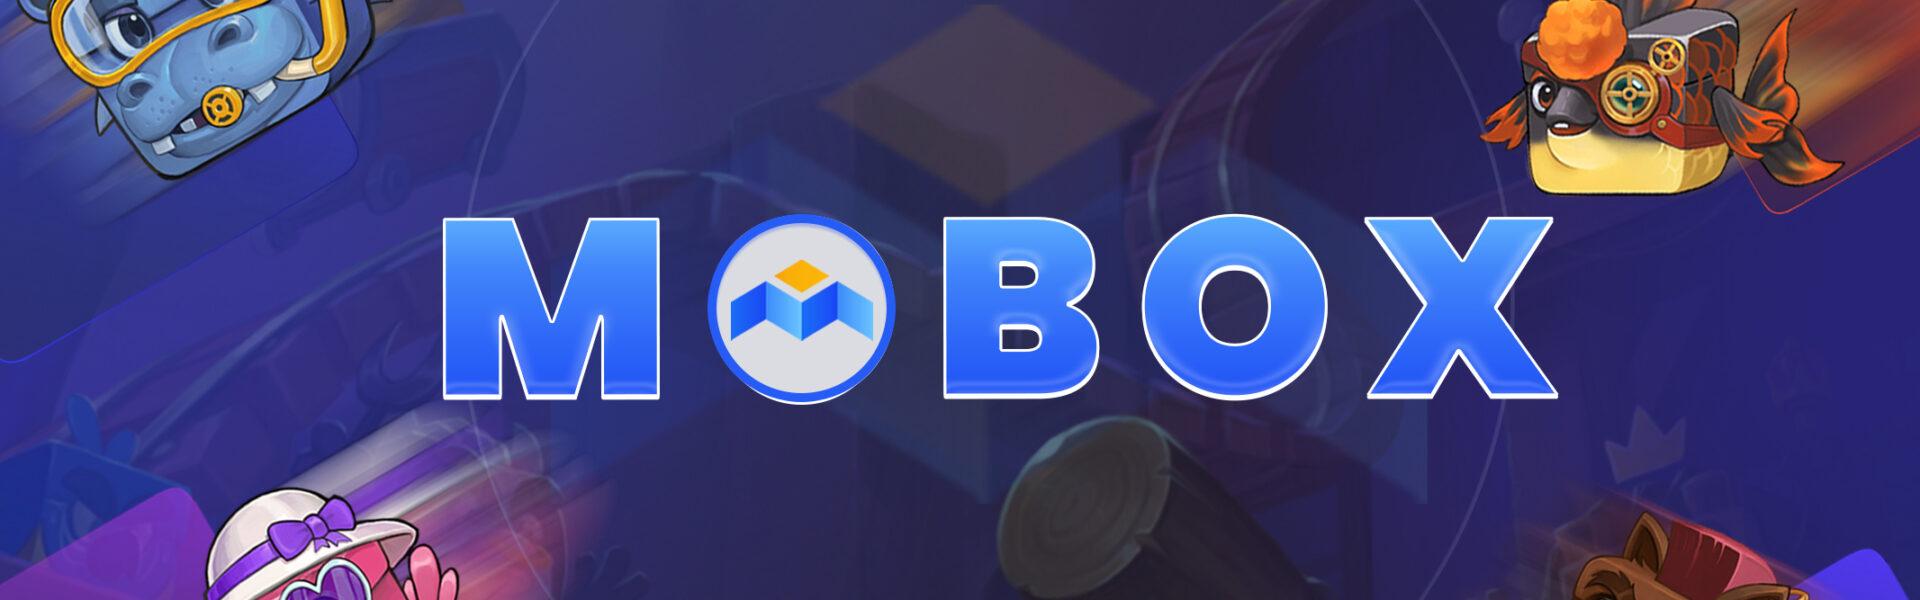 عملة Mbox